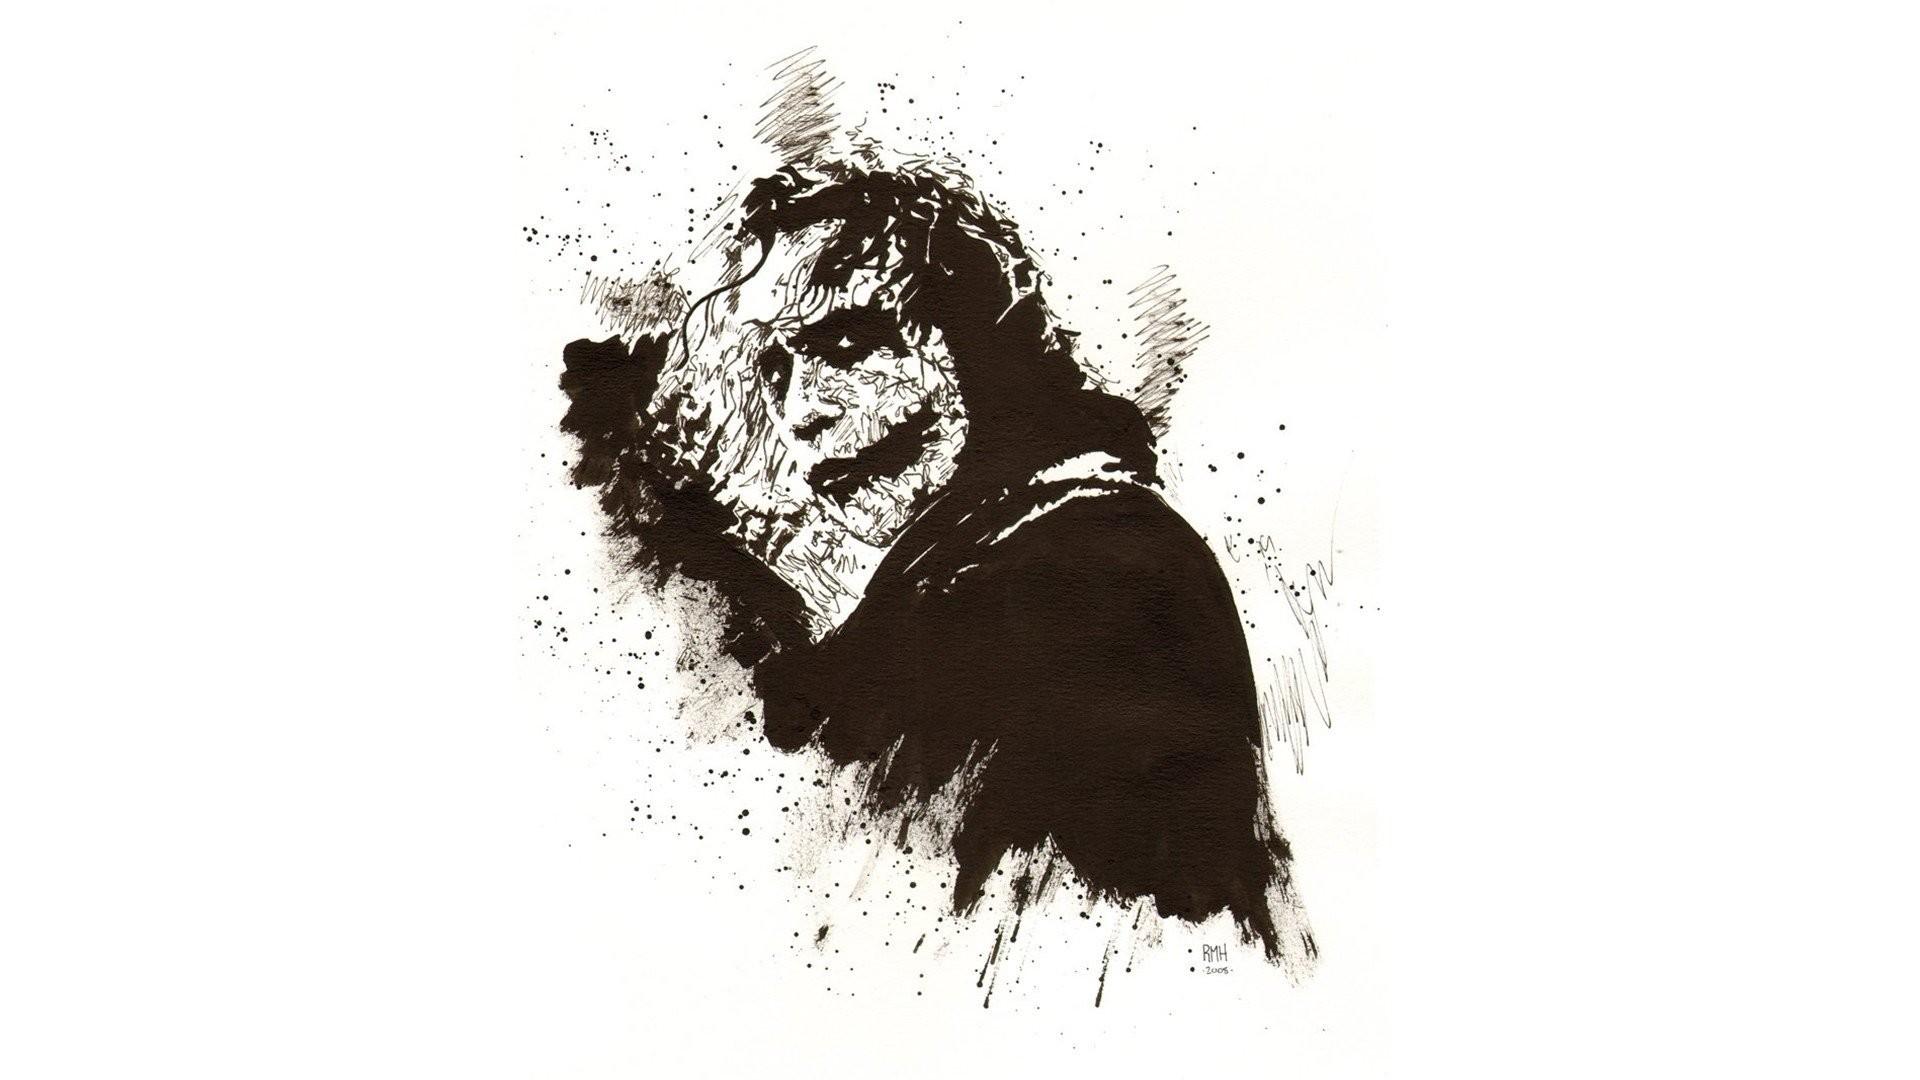 Abstract Fan Art Heath Ledger Movies The Dark Knight Joker